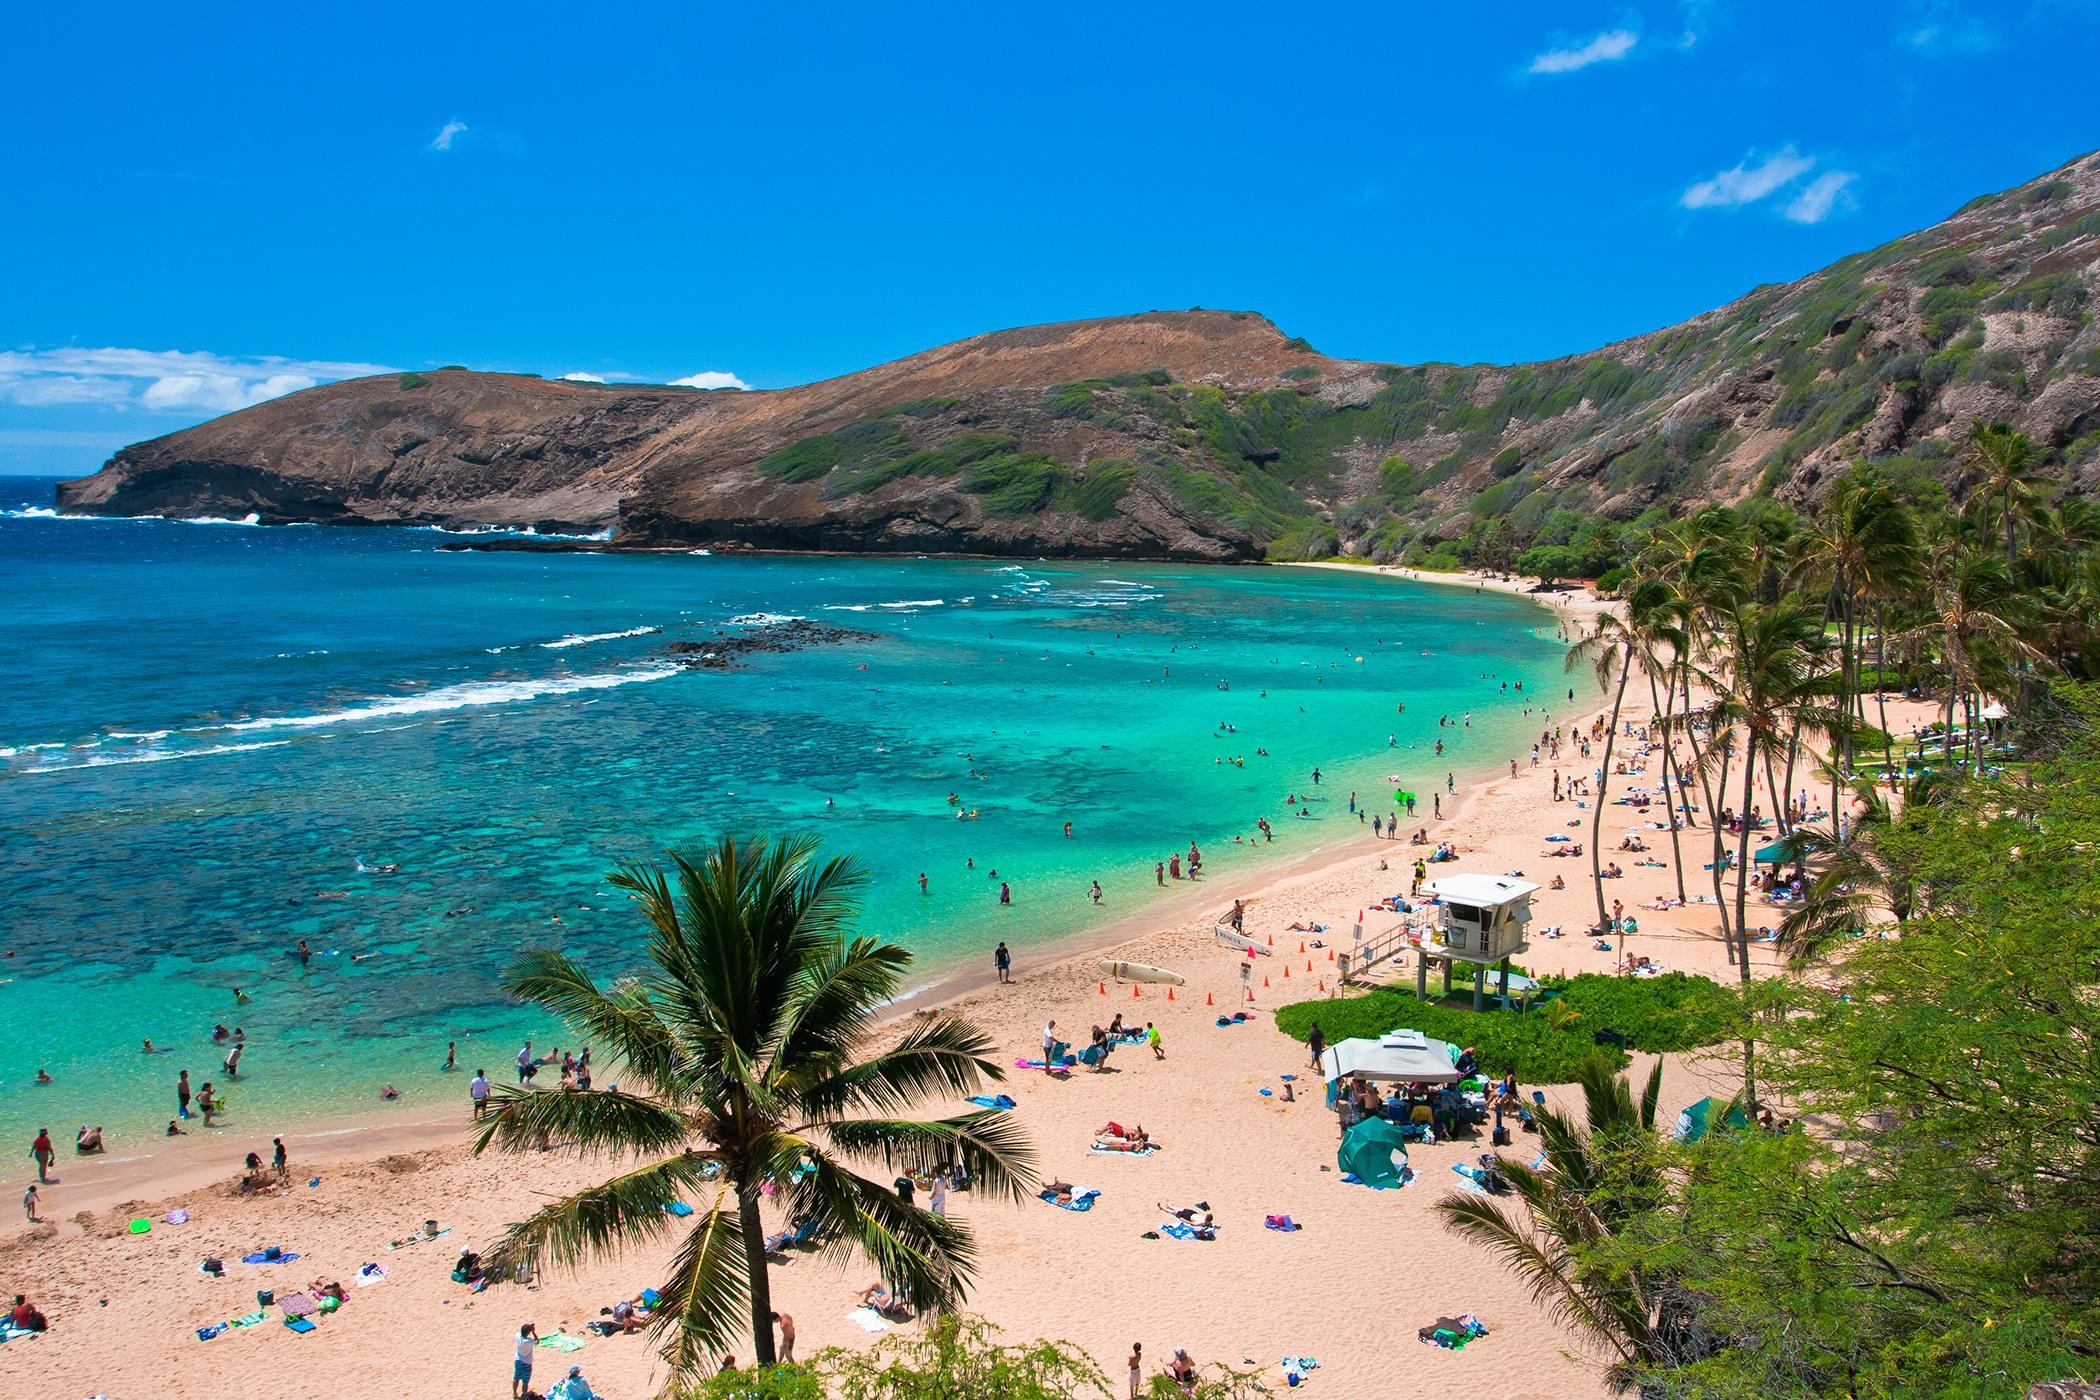 The-Royal-Hawaiian-Resort-Local-Attraction-Hanauma-Bay-Nature-Preserve.jpg